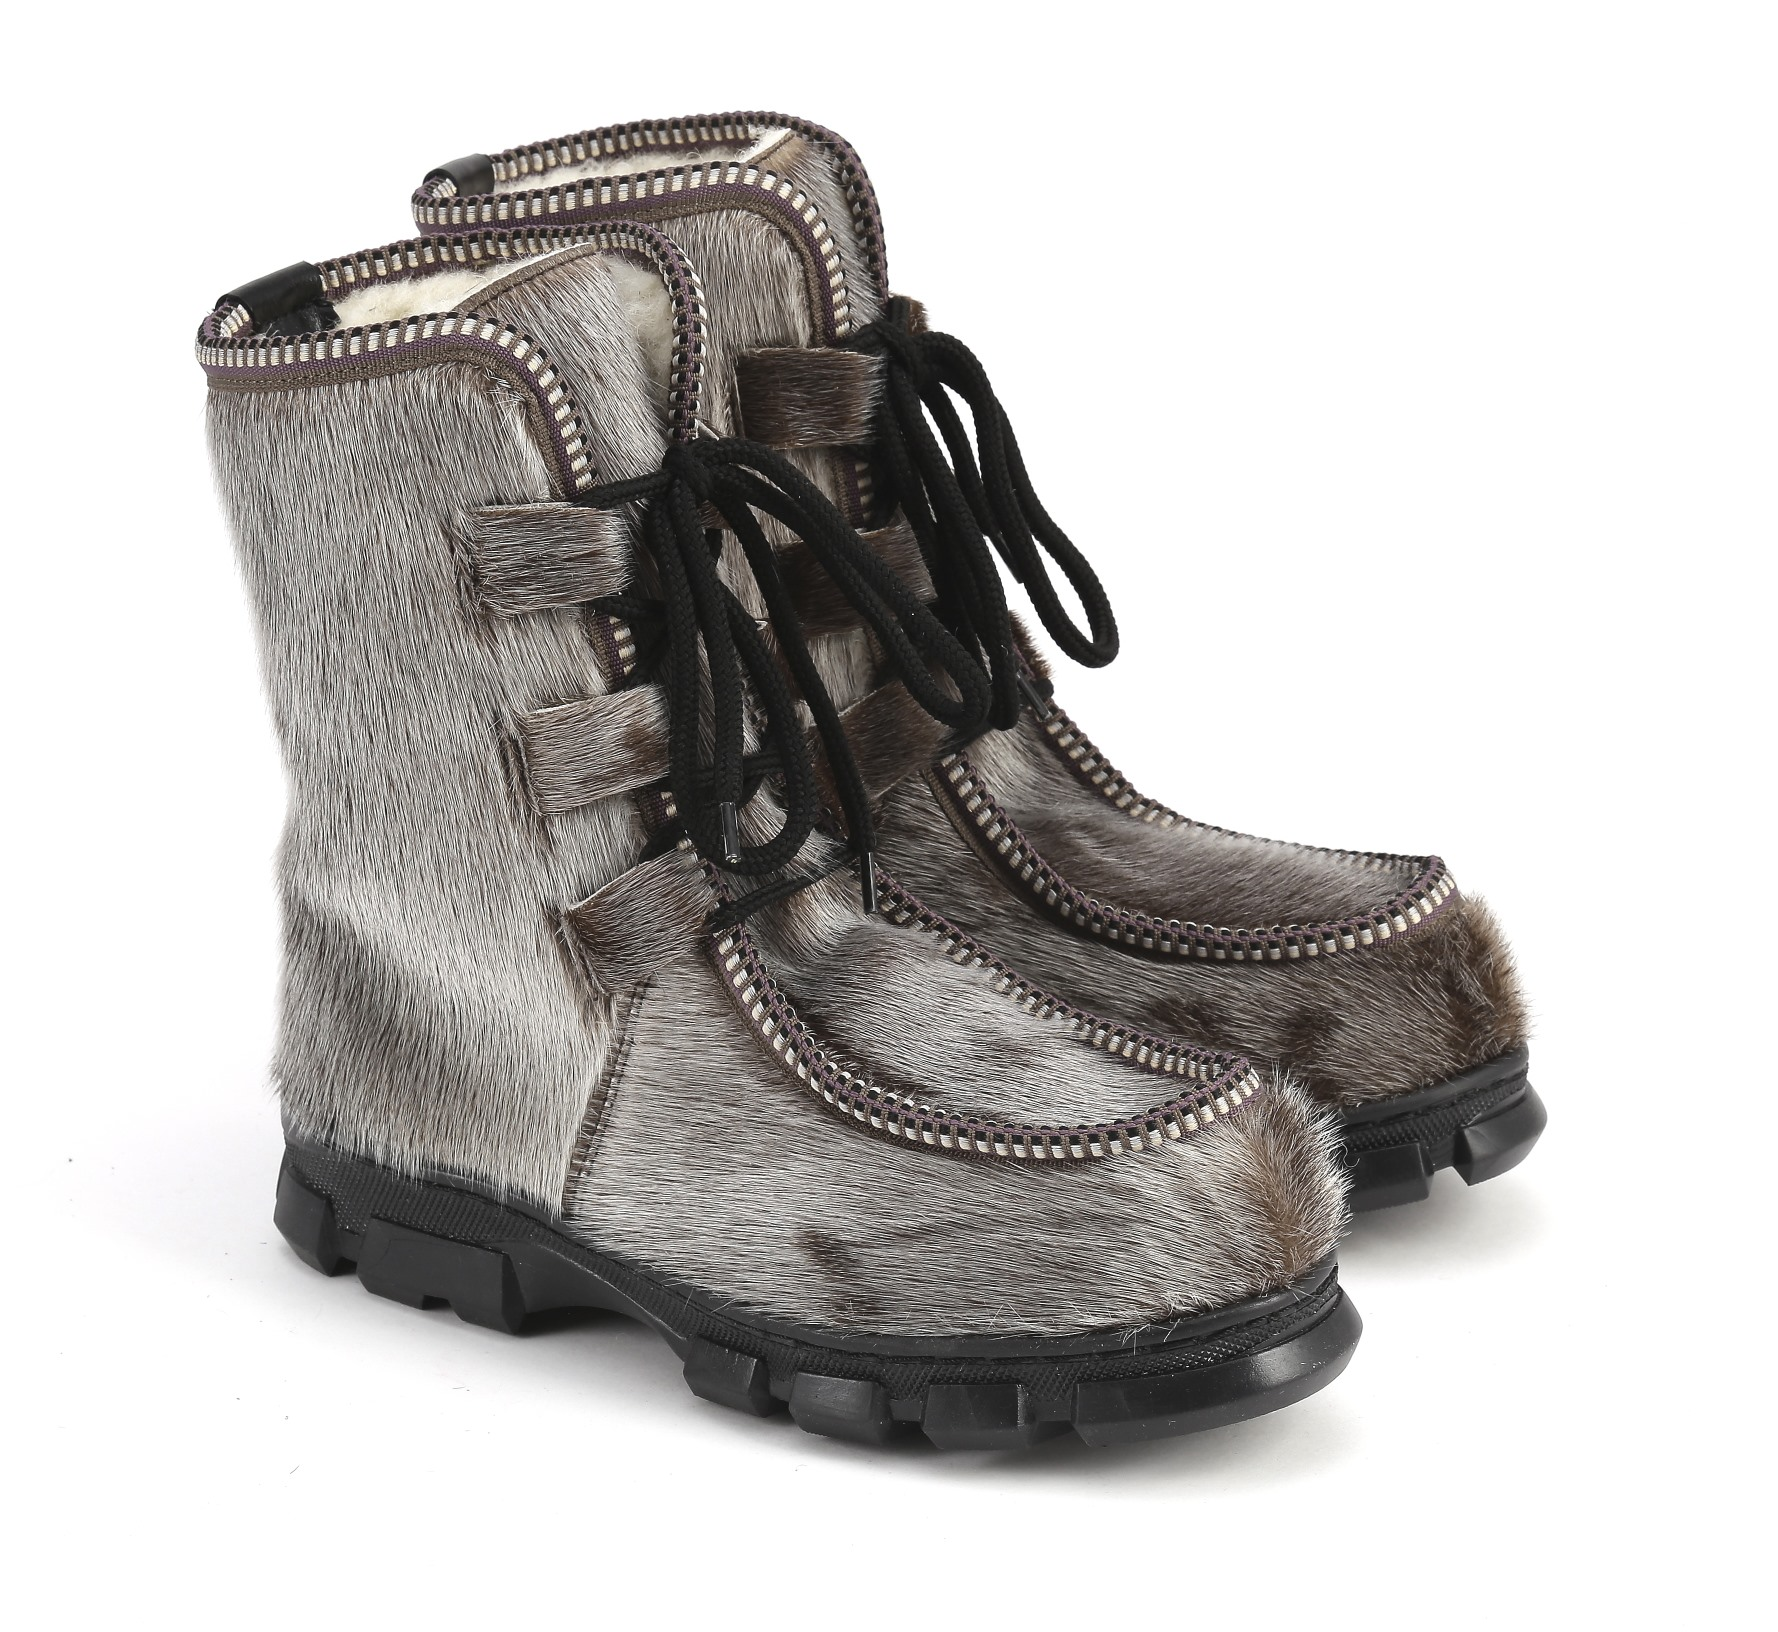 Обувь зимняя, EthnoBoot, natural, size 40